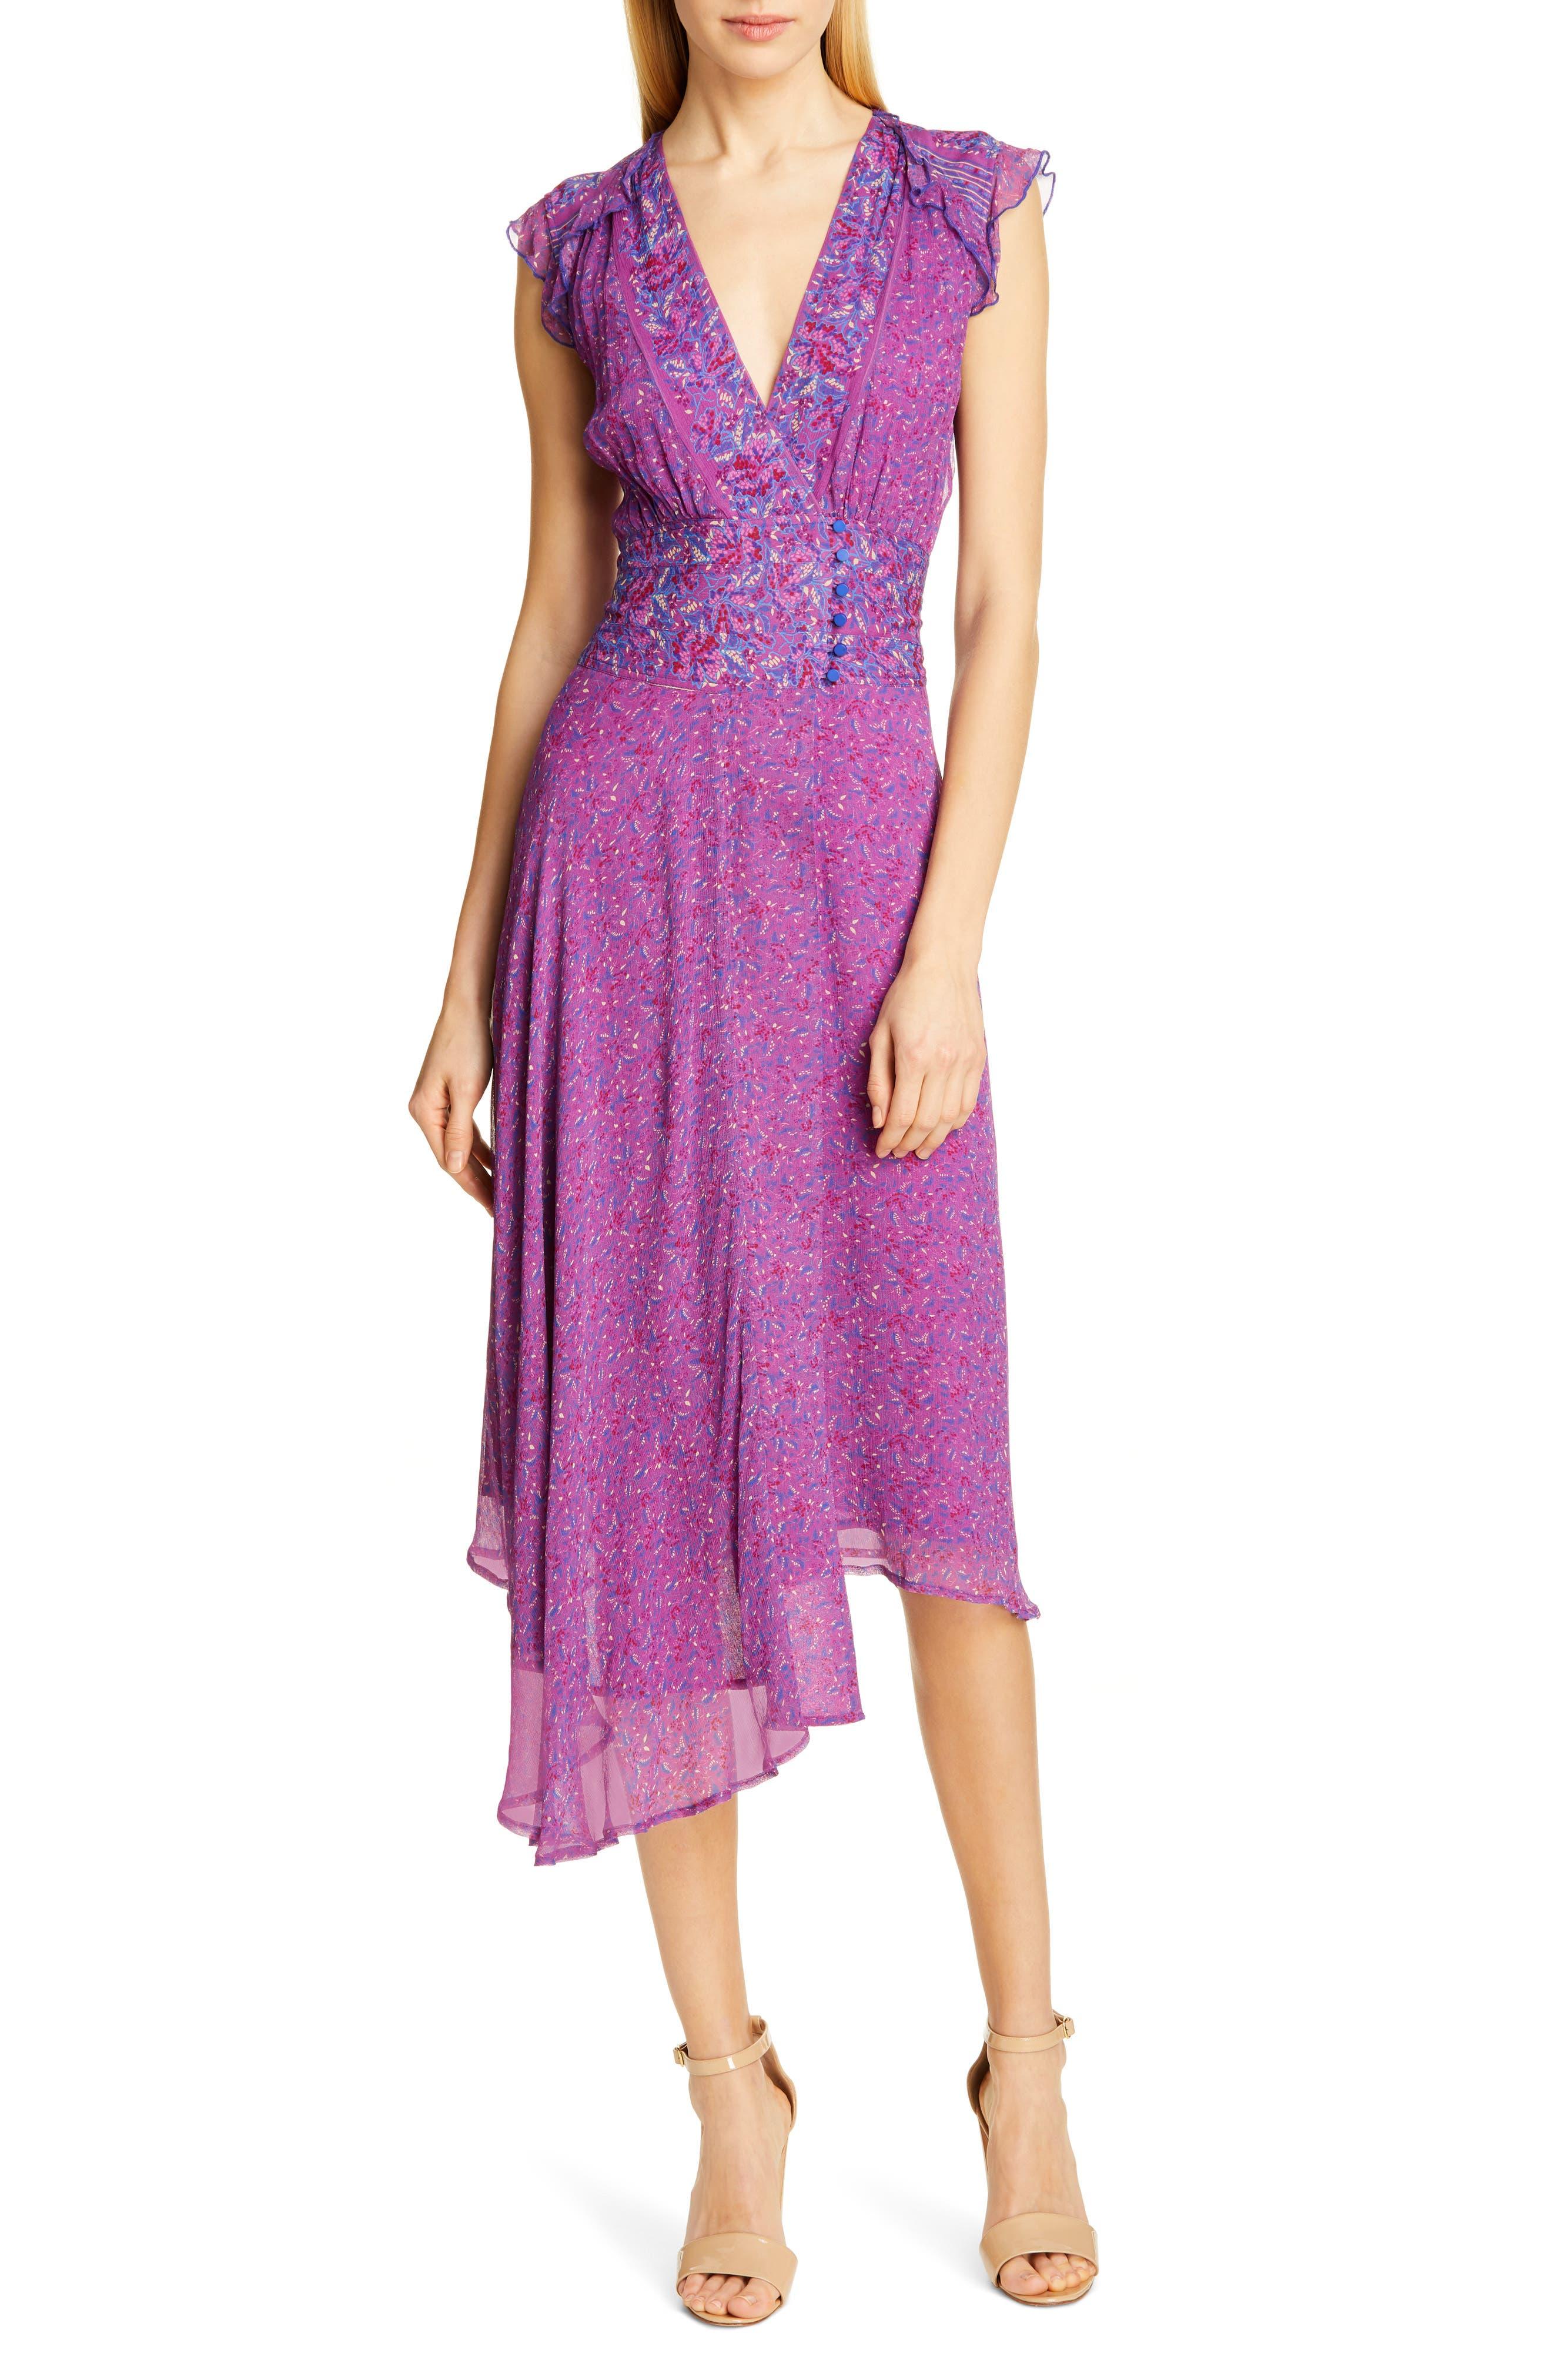 Ba & sh Meryl Floral Dress, Pink